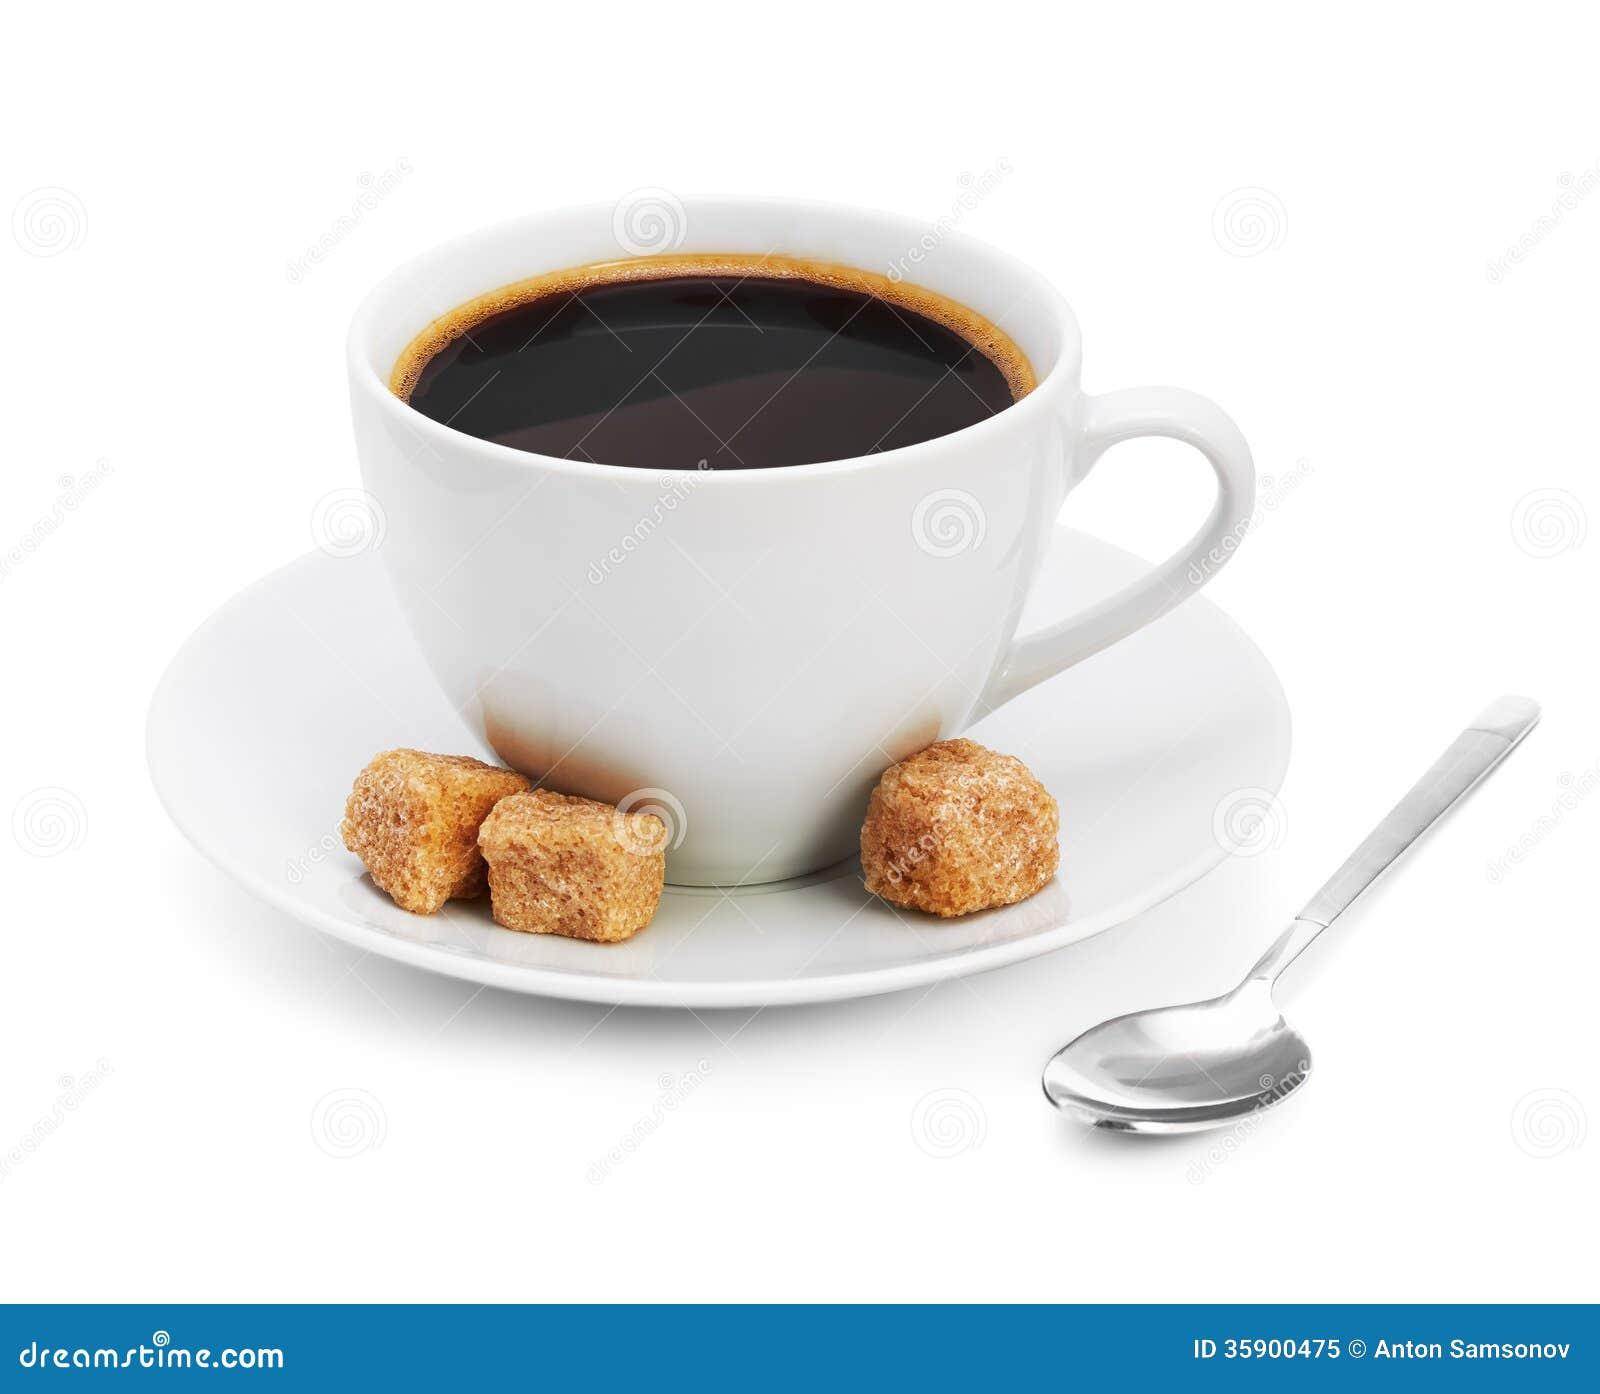 hot coffee white background - photo #15